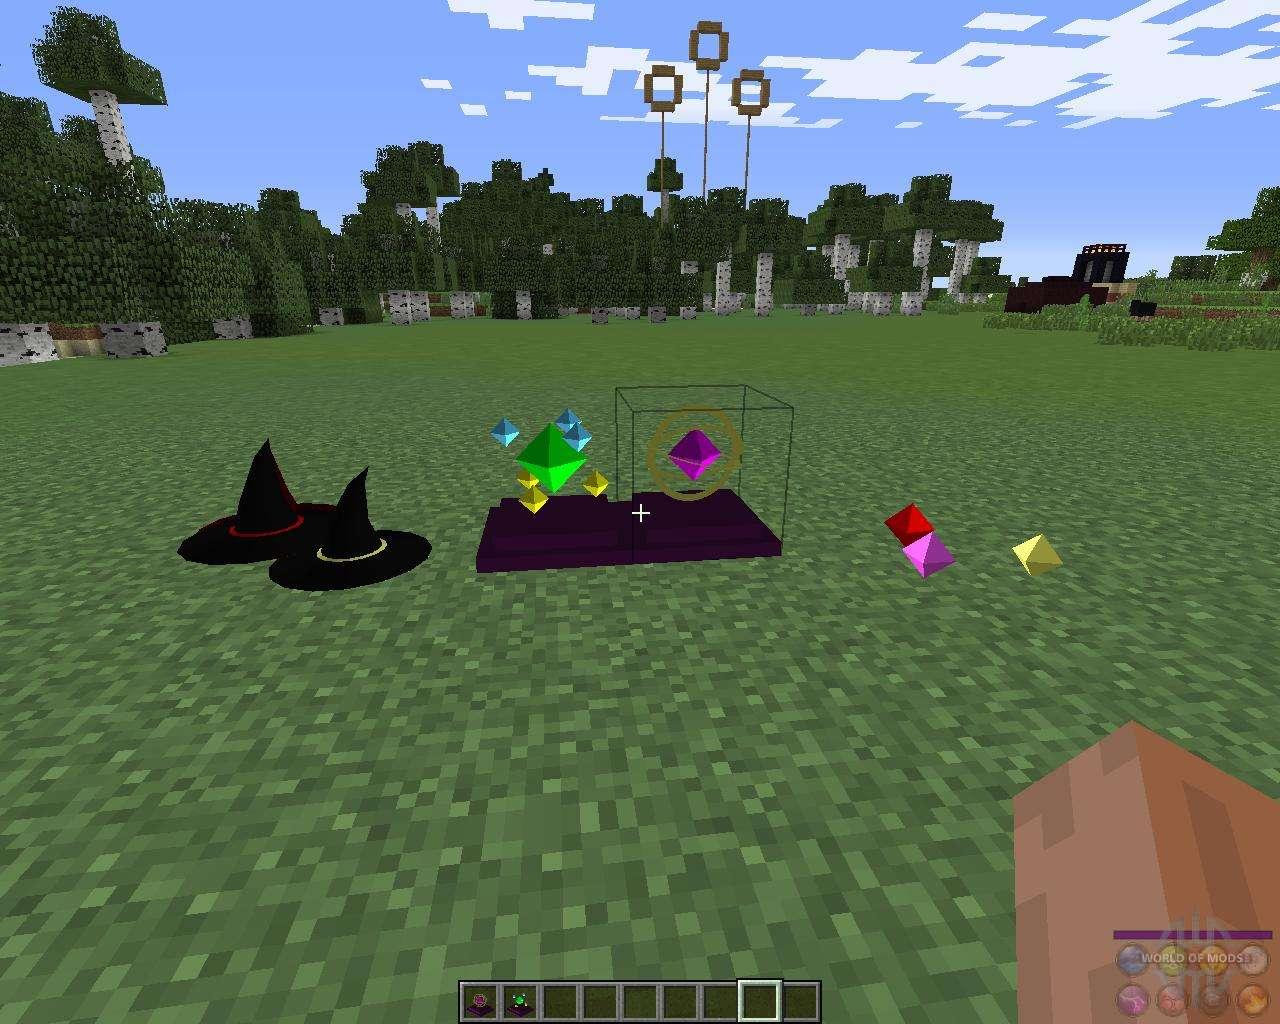 minecraft minegicka mod 1.5.2